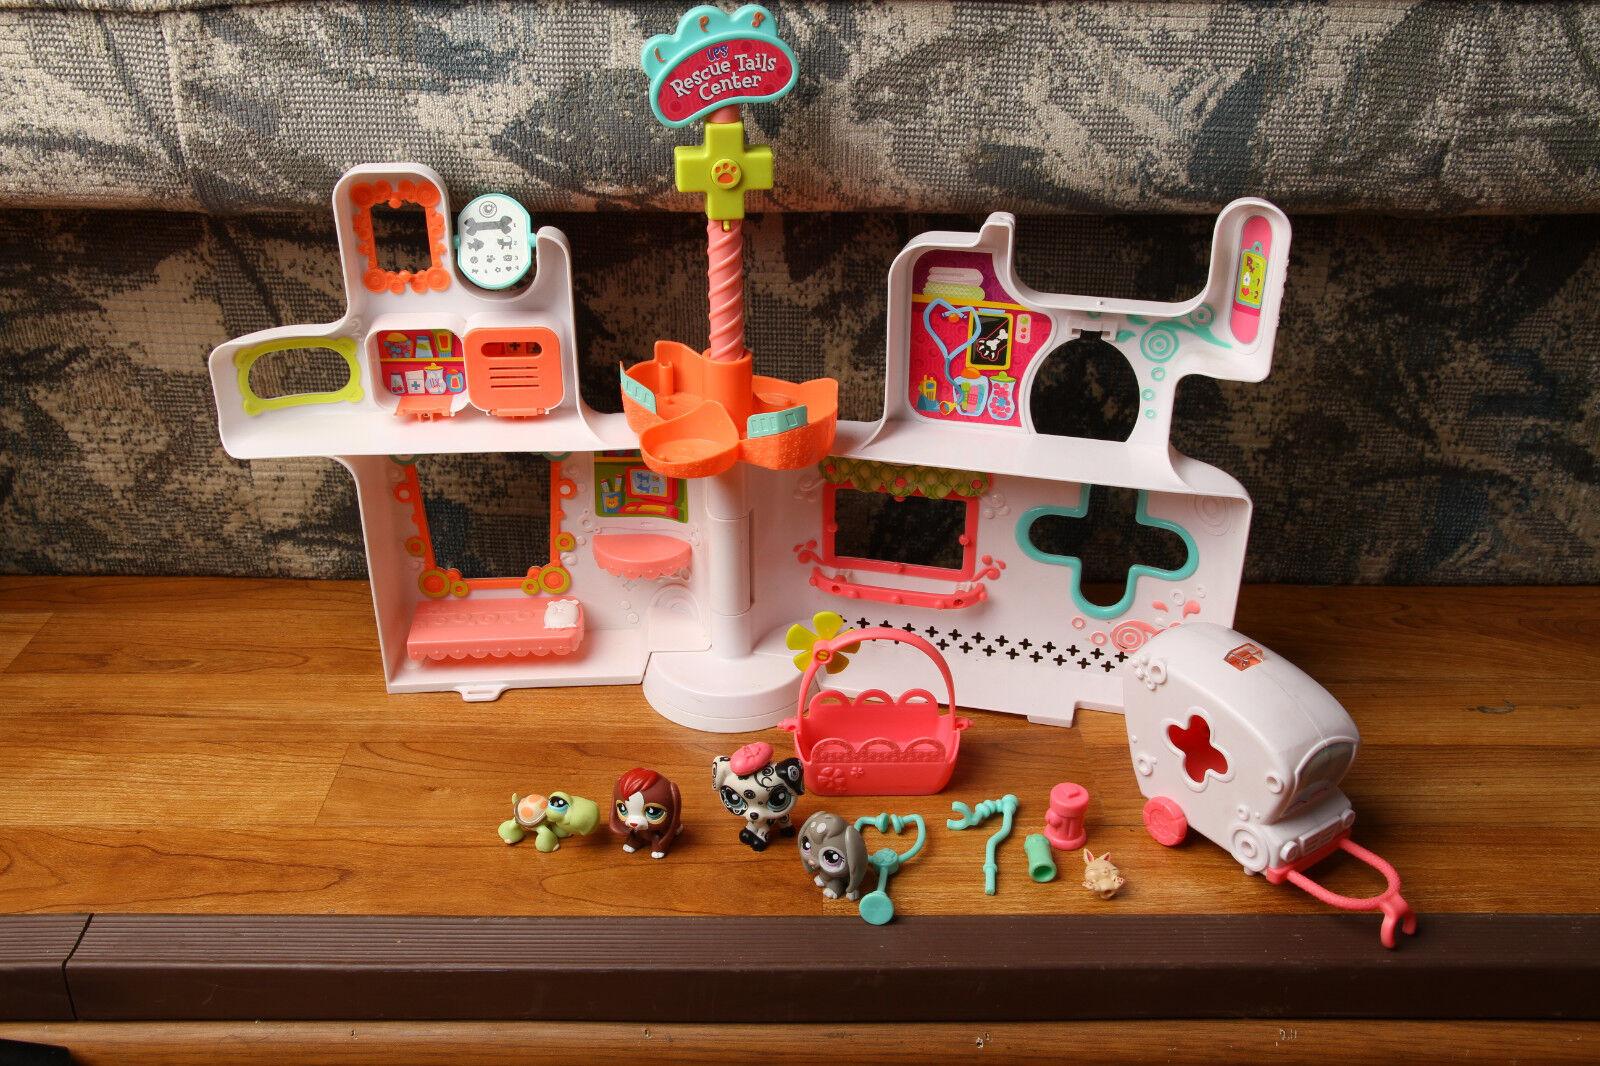 Littlest Pet Shop Rescue Tails Center Playset w    Ambulance & Figures Hasbro 2009 45913b